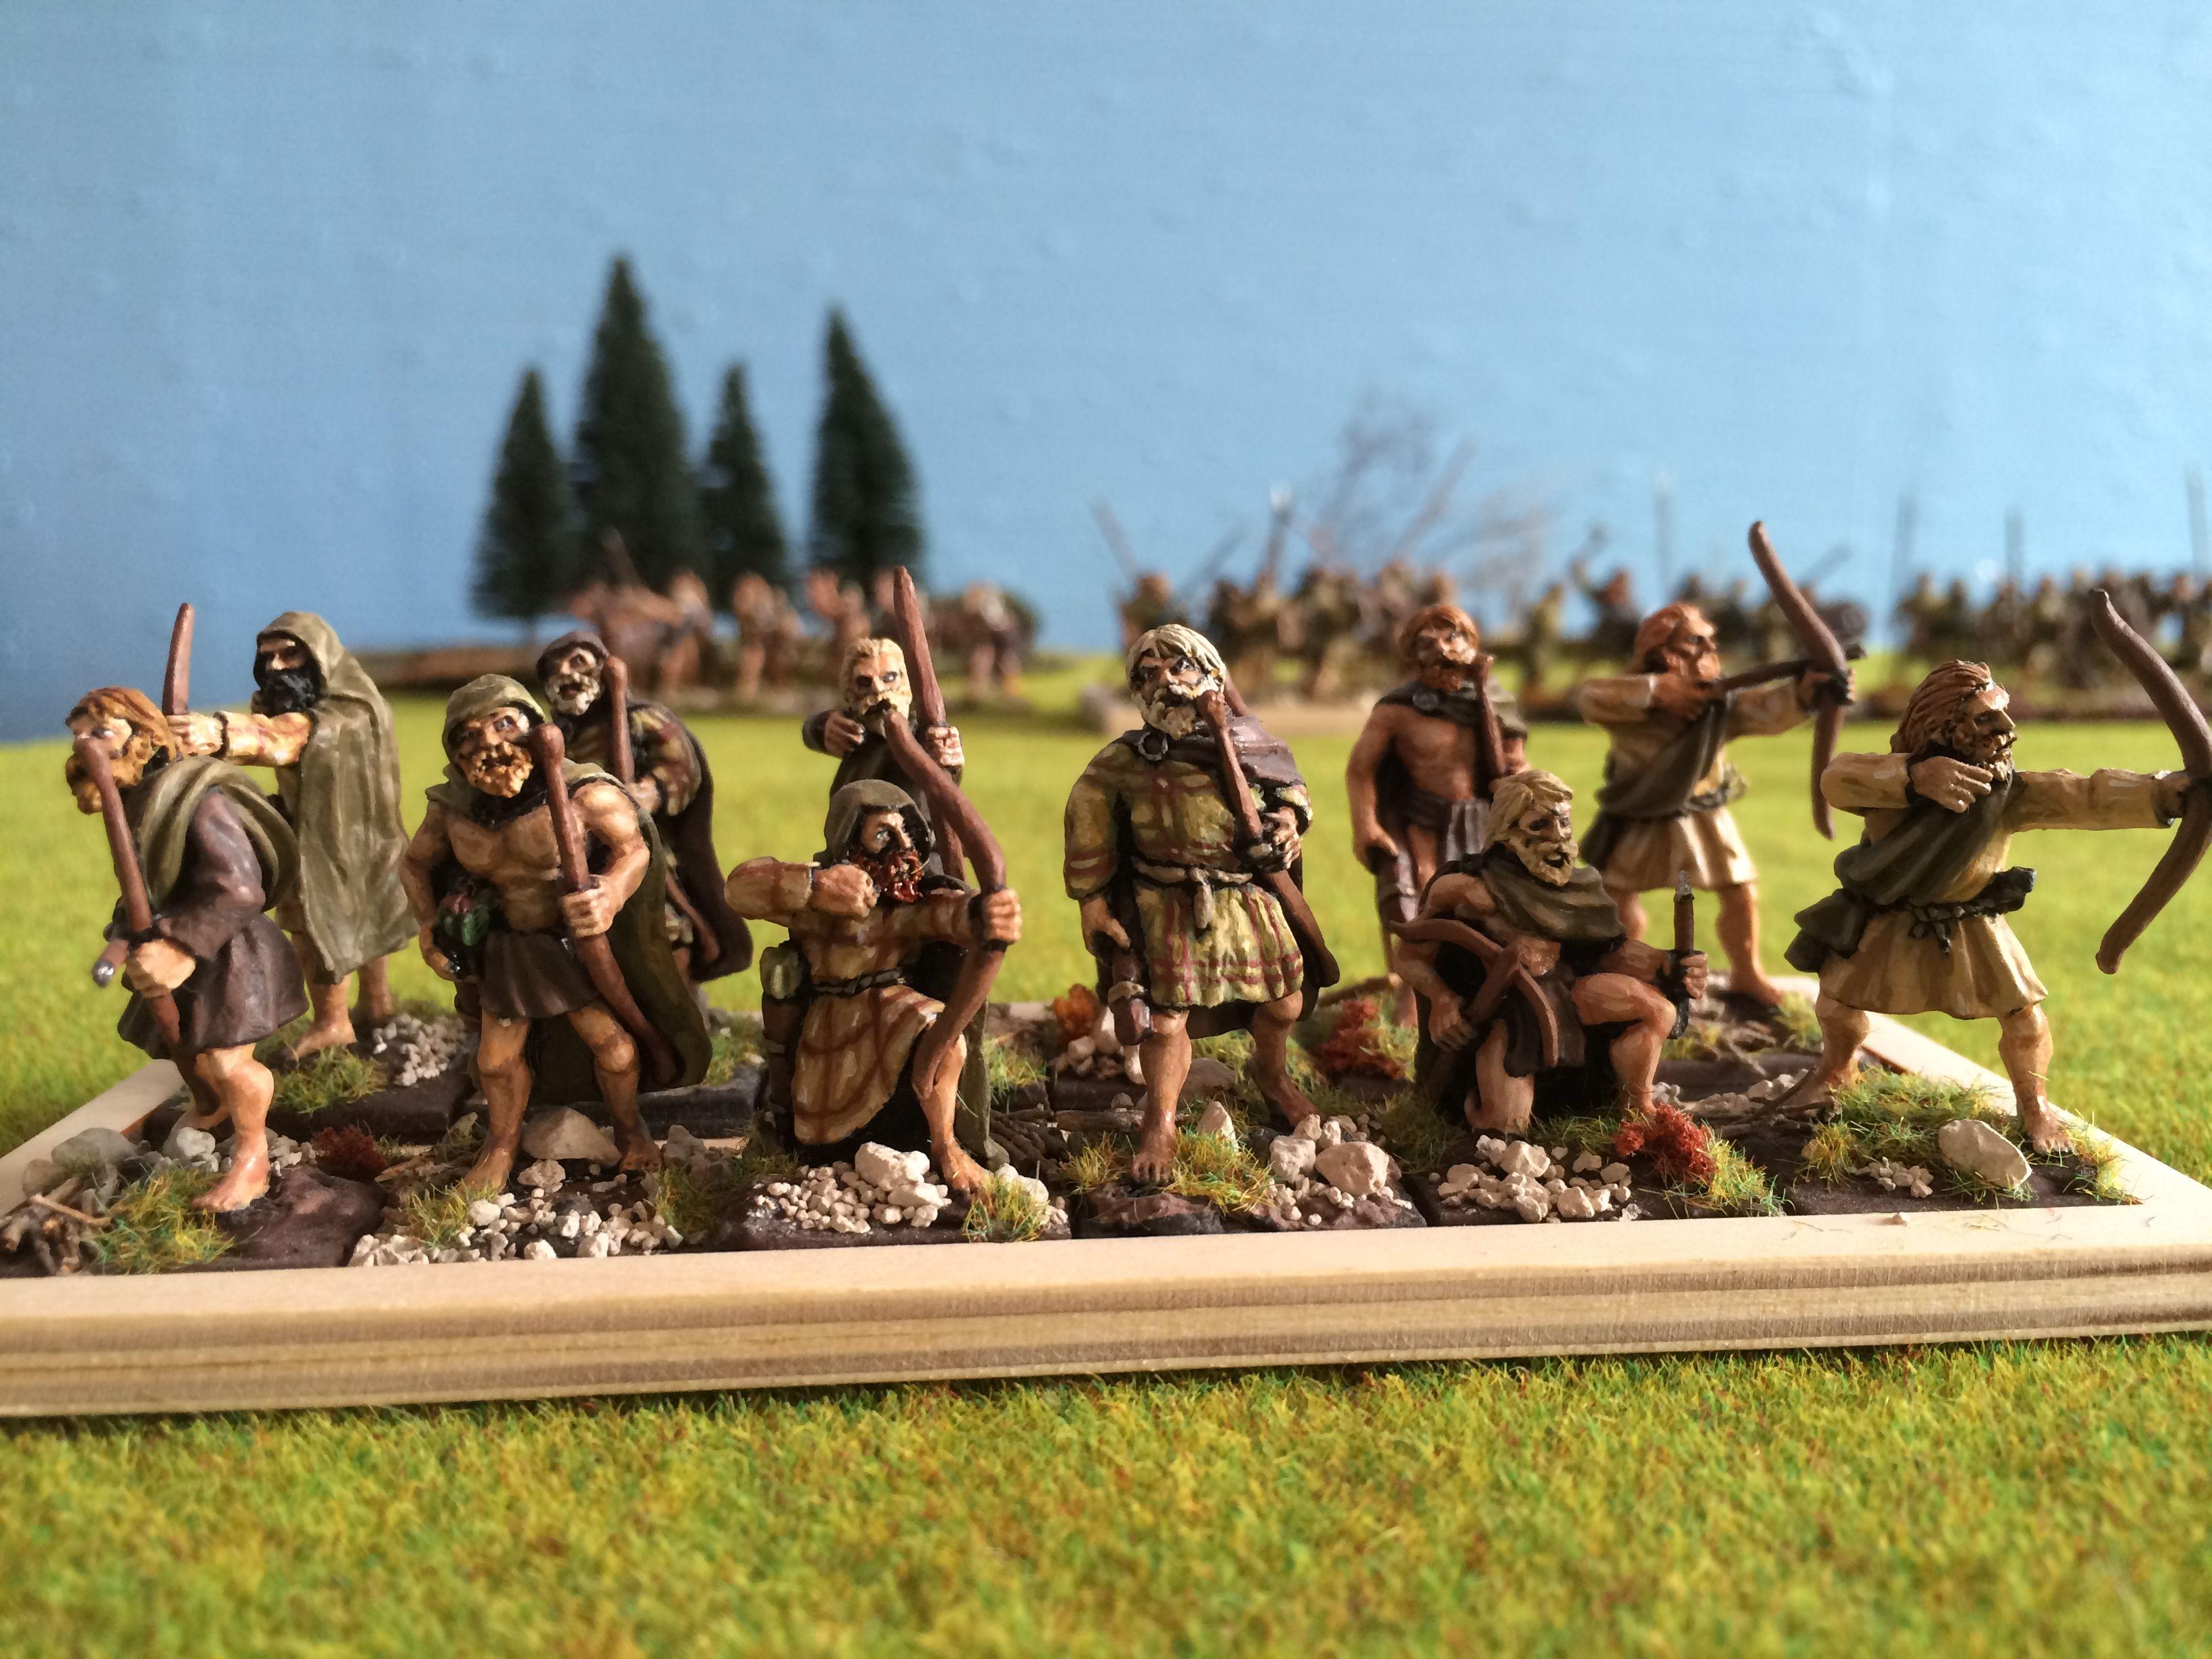 Pumarhh archers pictes figurines 28mm SAGA skirmish games Black Tree Design miniatures pict bowmen hunters